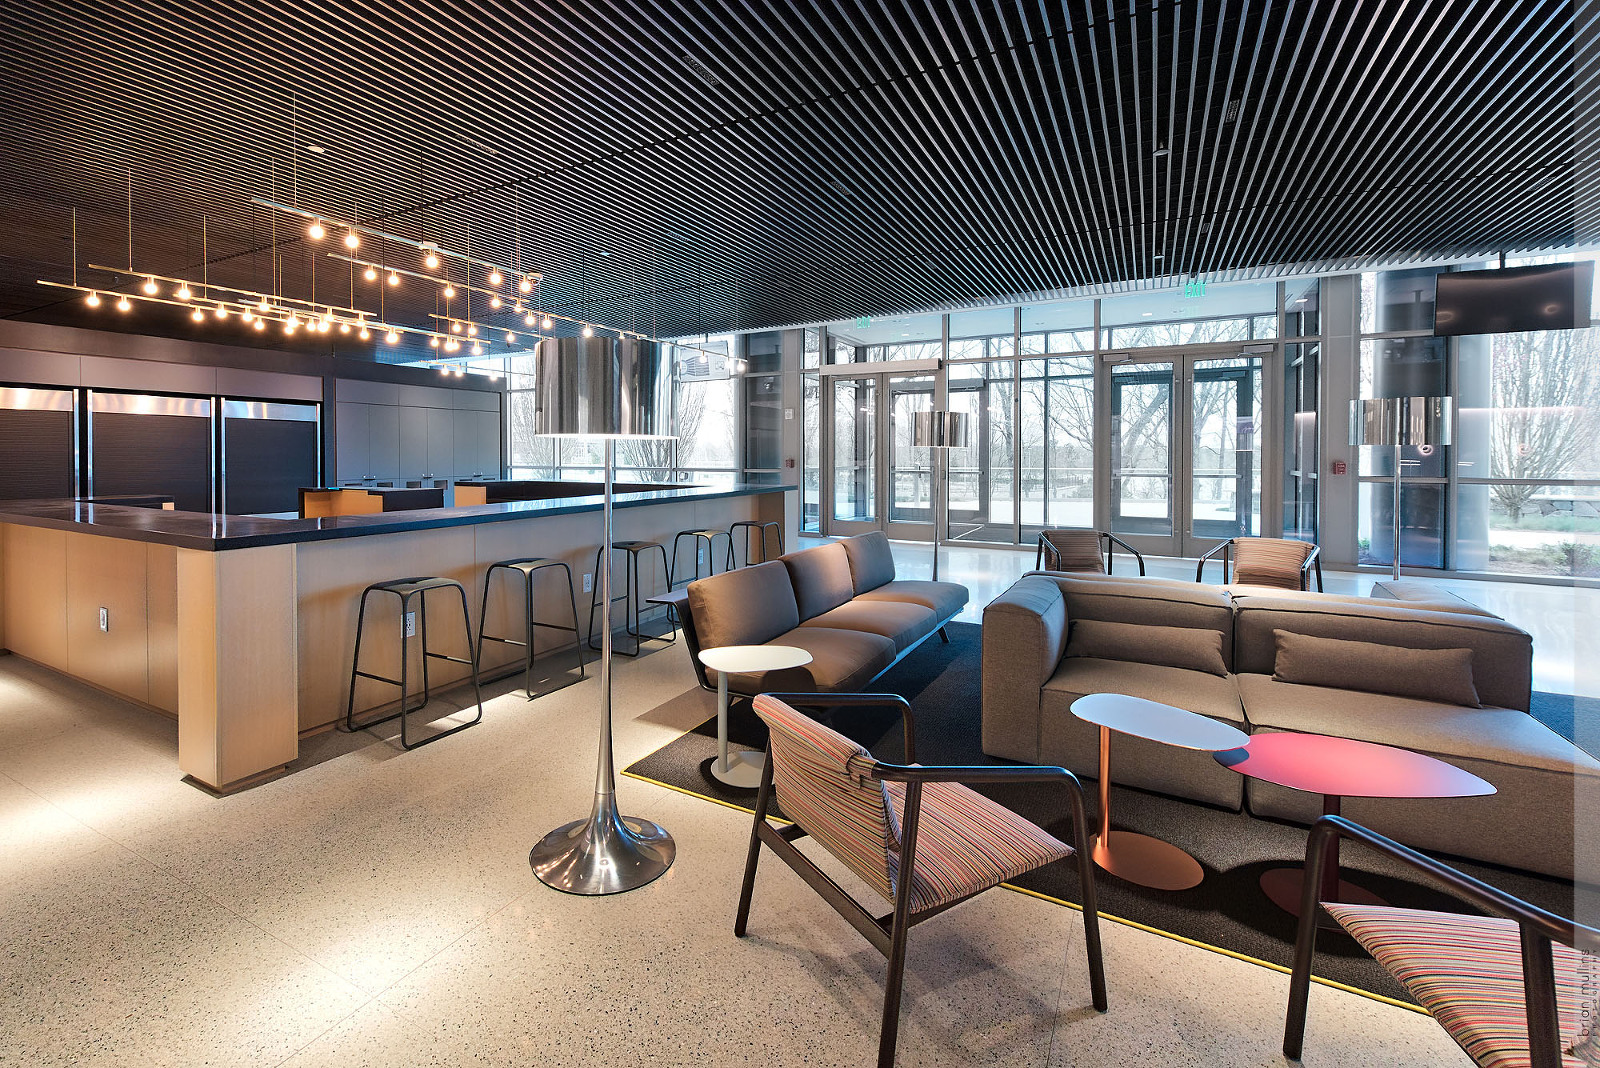 commercial kitchen architecture